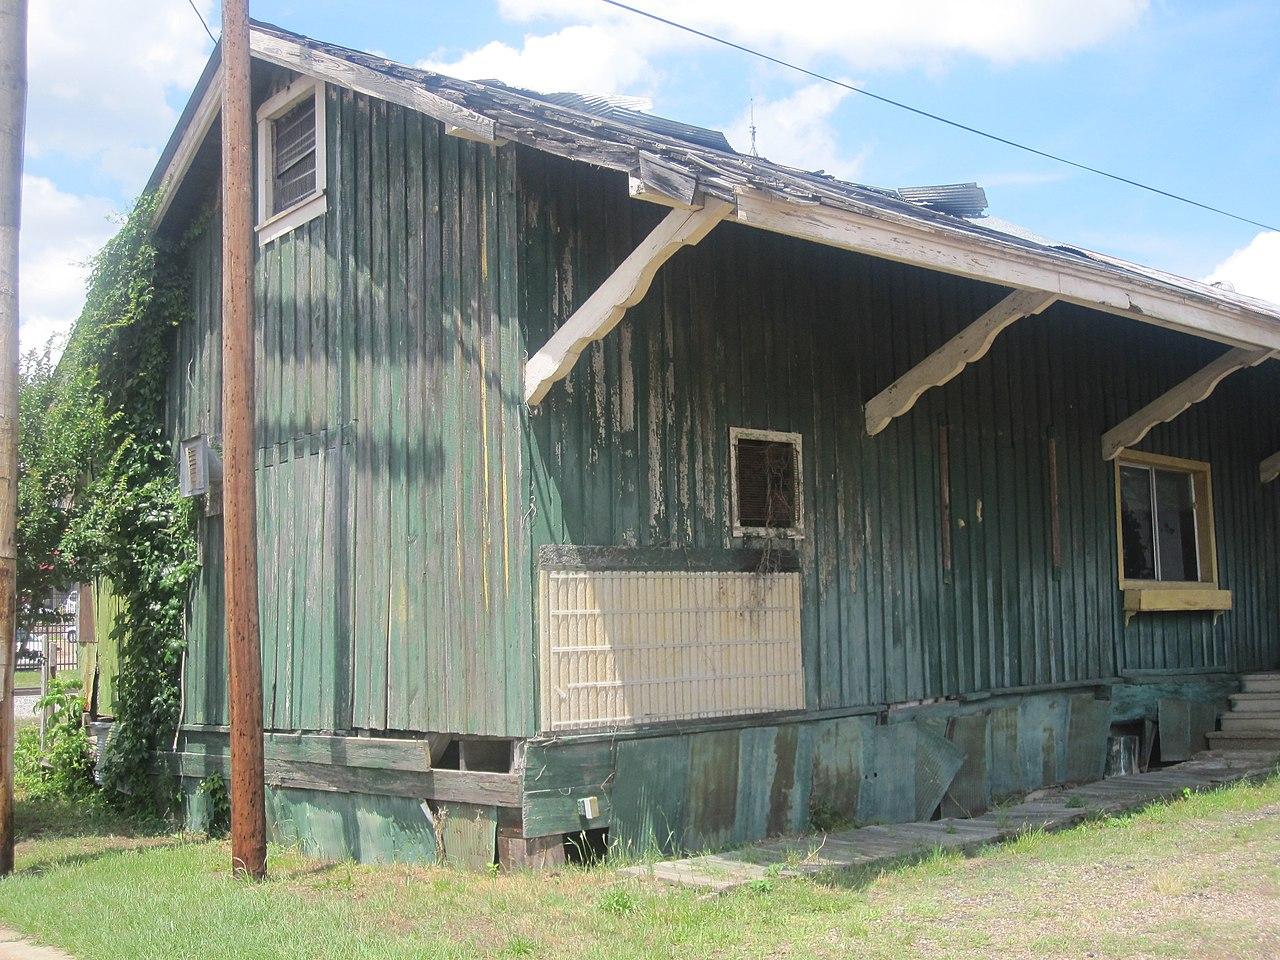 file railroad depot in ruston la img 3826 jpg wikipedia